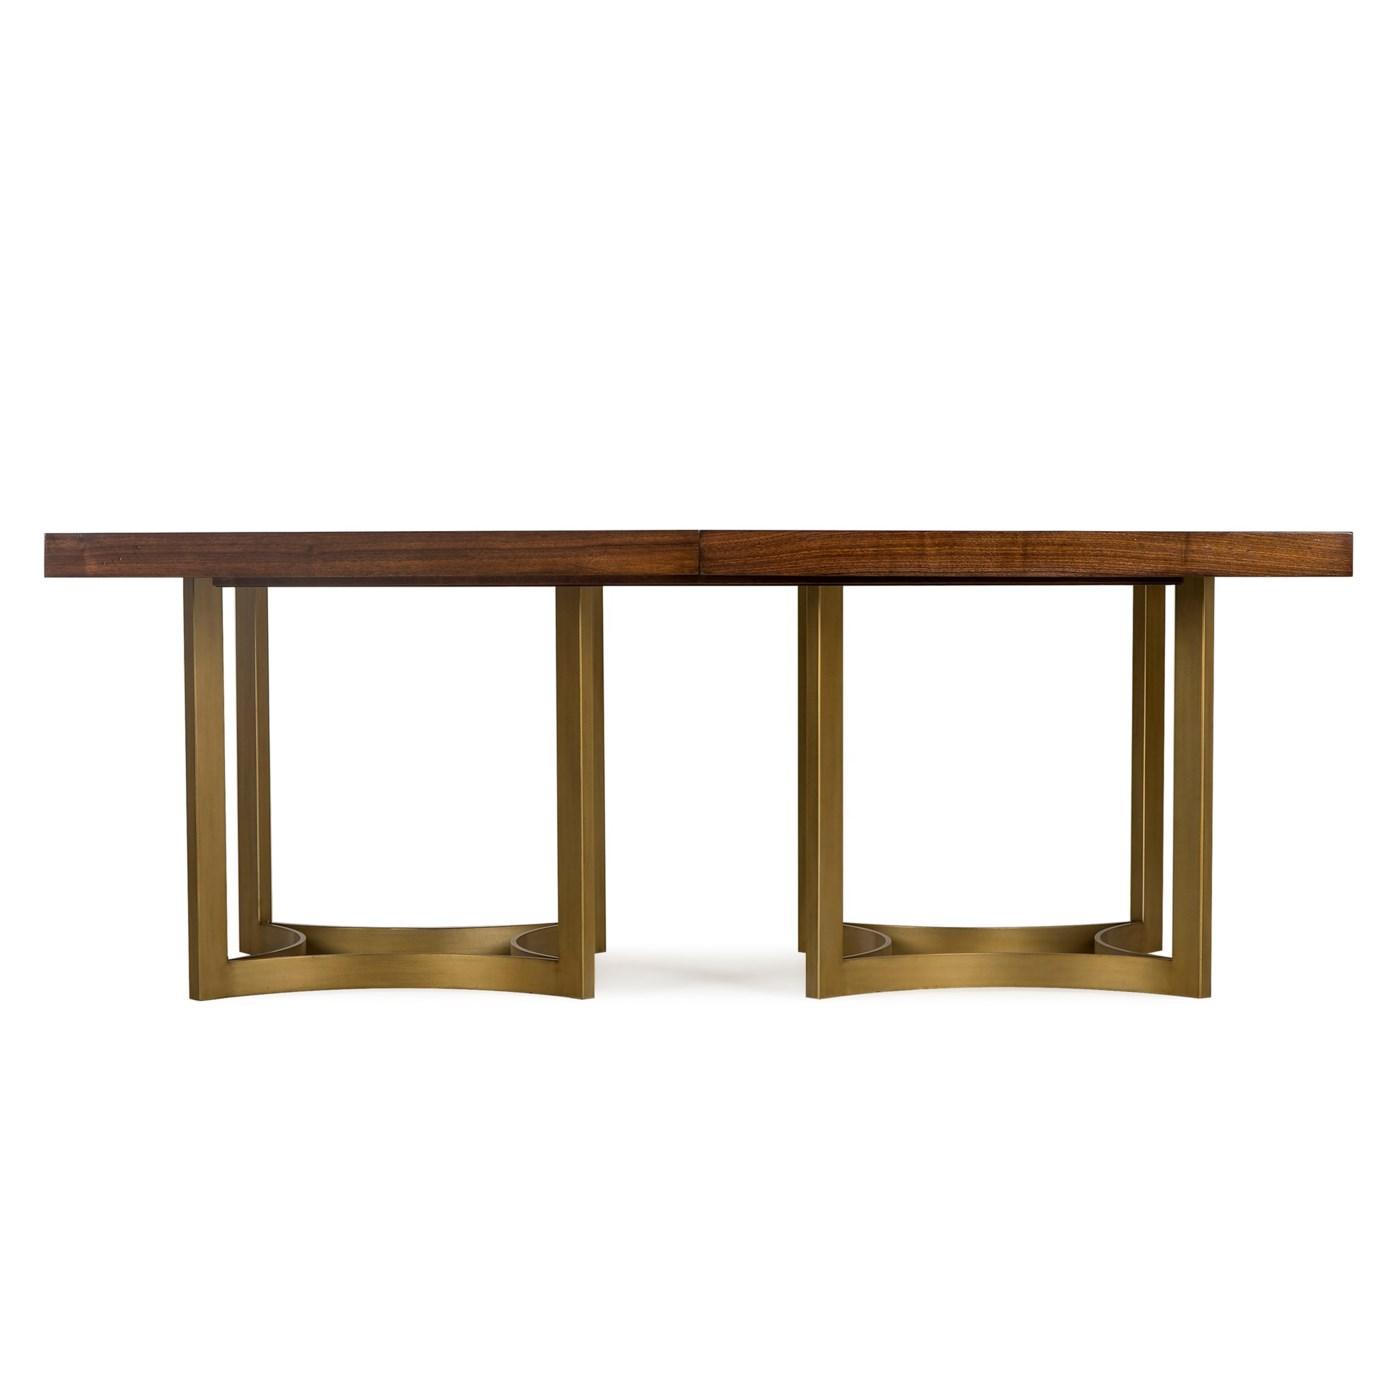 Ashton Dining Table LargeRectangle Dining Tables Resource Decor - Ashton coffee table